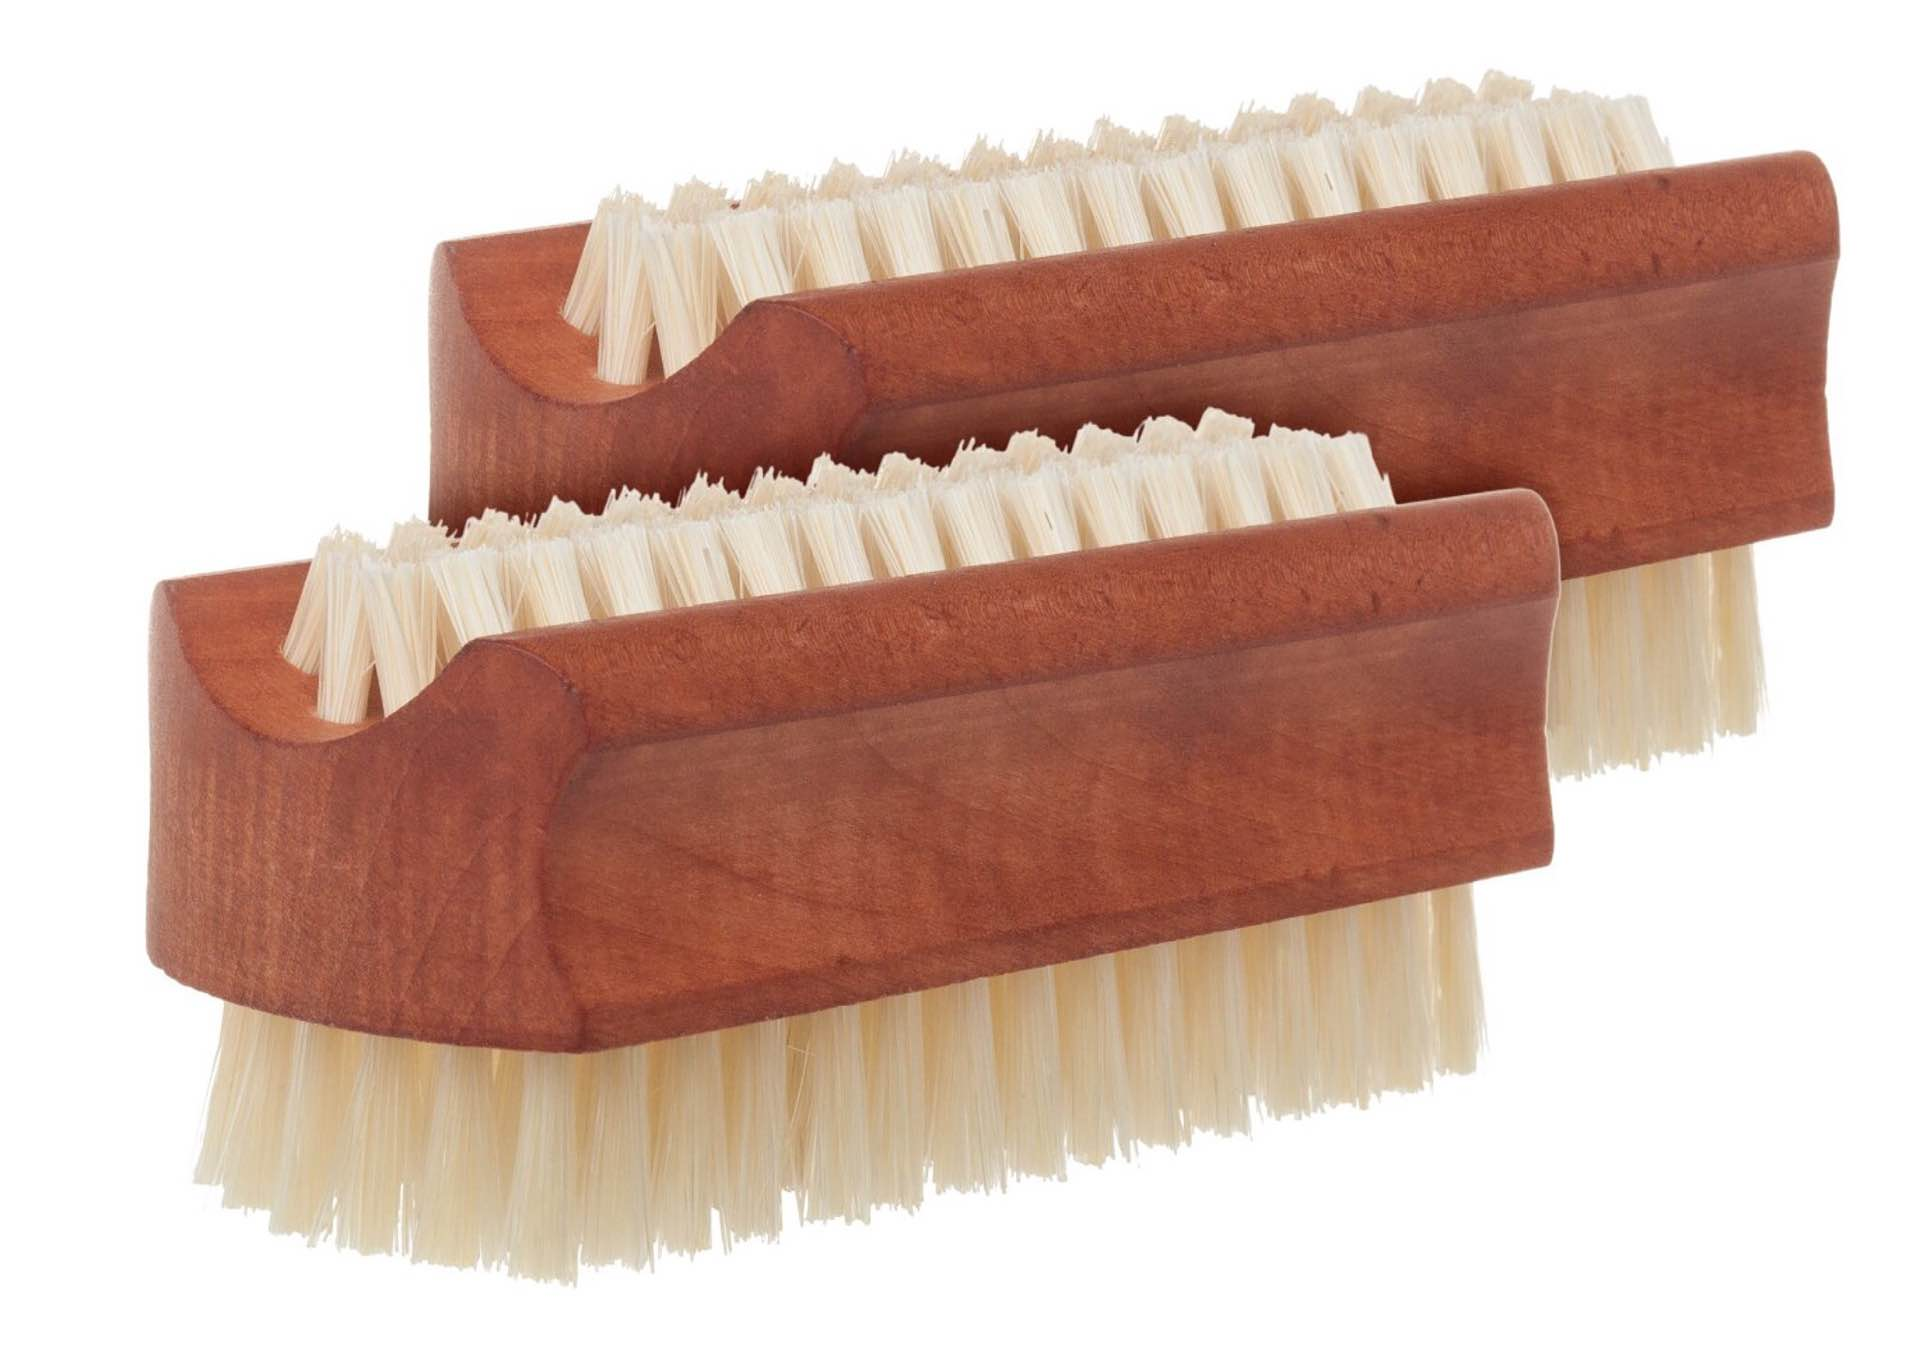 burstenhaus-redecker-wooden-nail-brushes